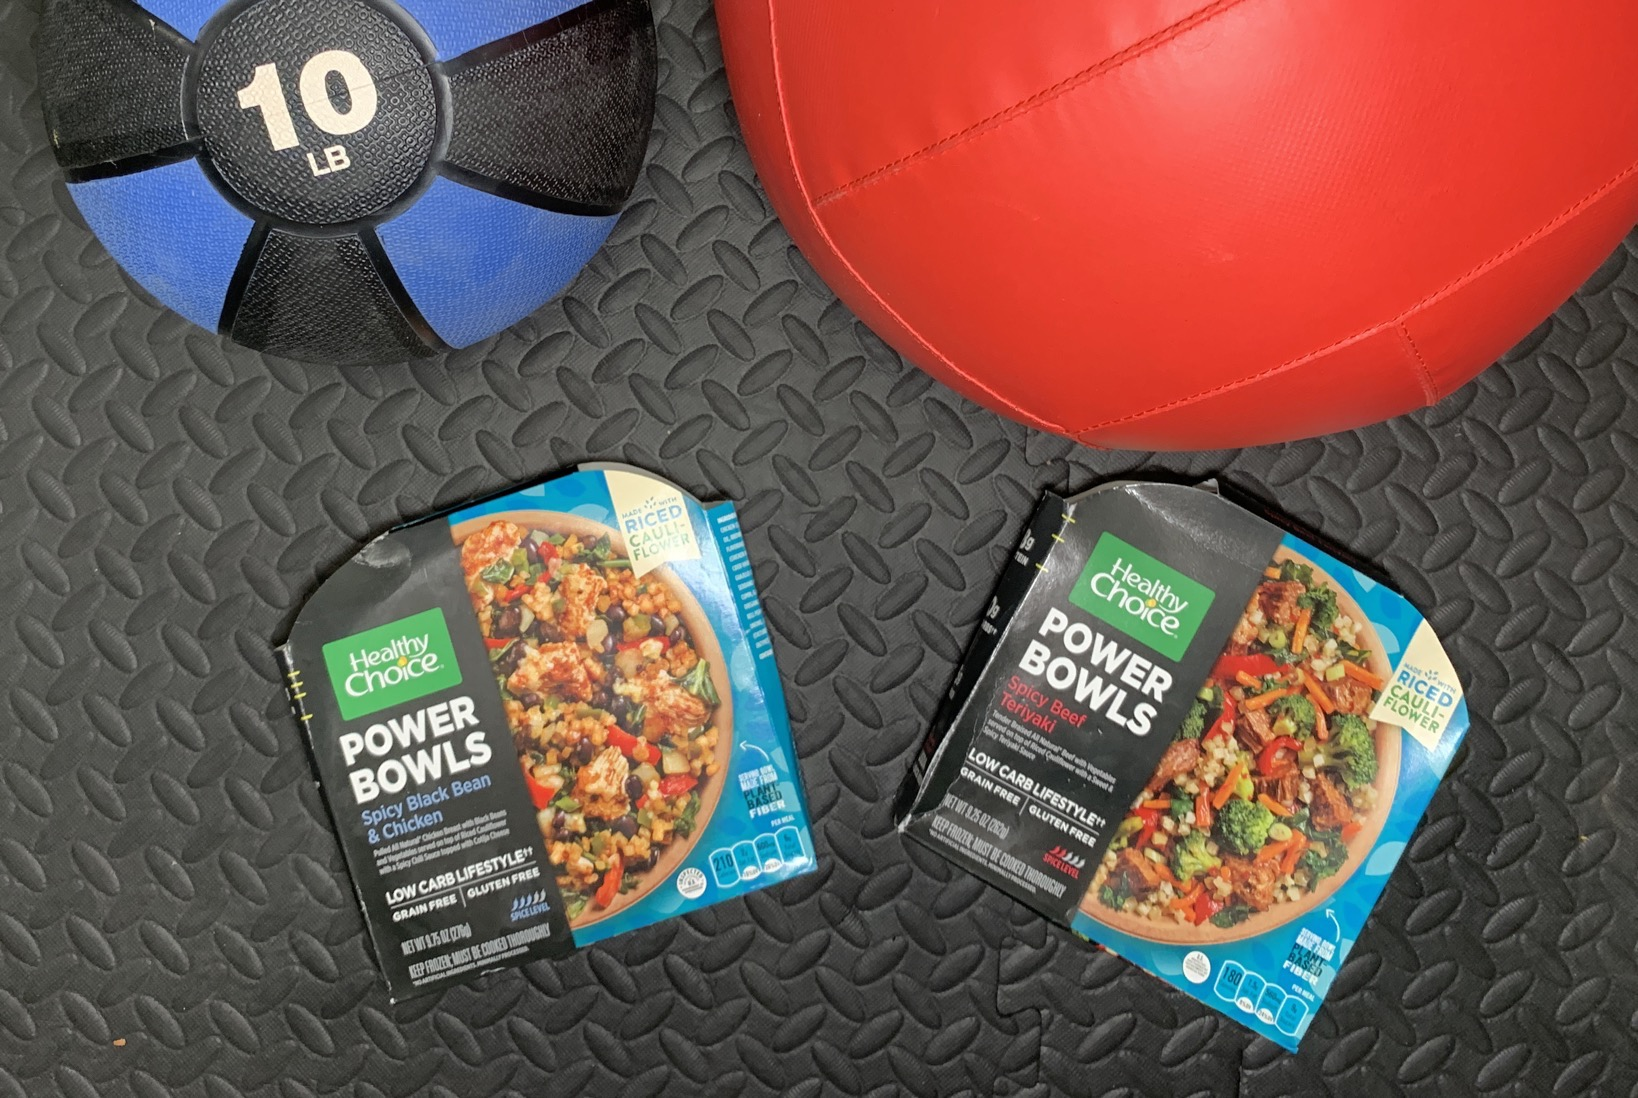 Healthy Choice Grain Free Power Bowls Spicy Beef Teriyaki and Healthy Choice Grain Free Power Bowls Spicy Black Bean & Chicken